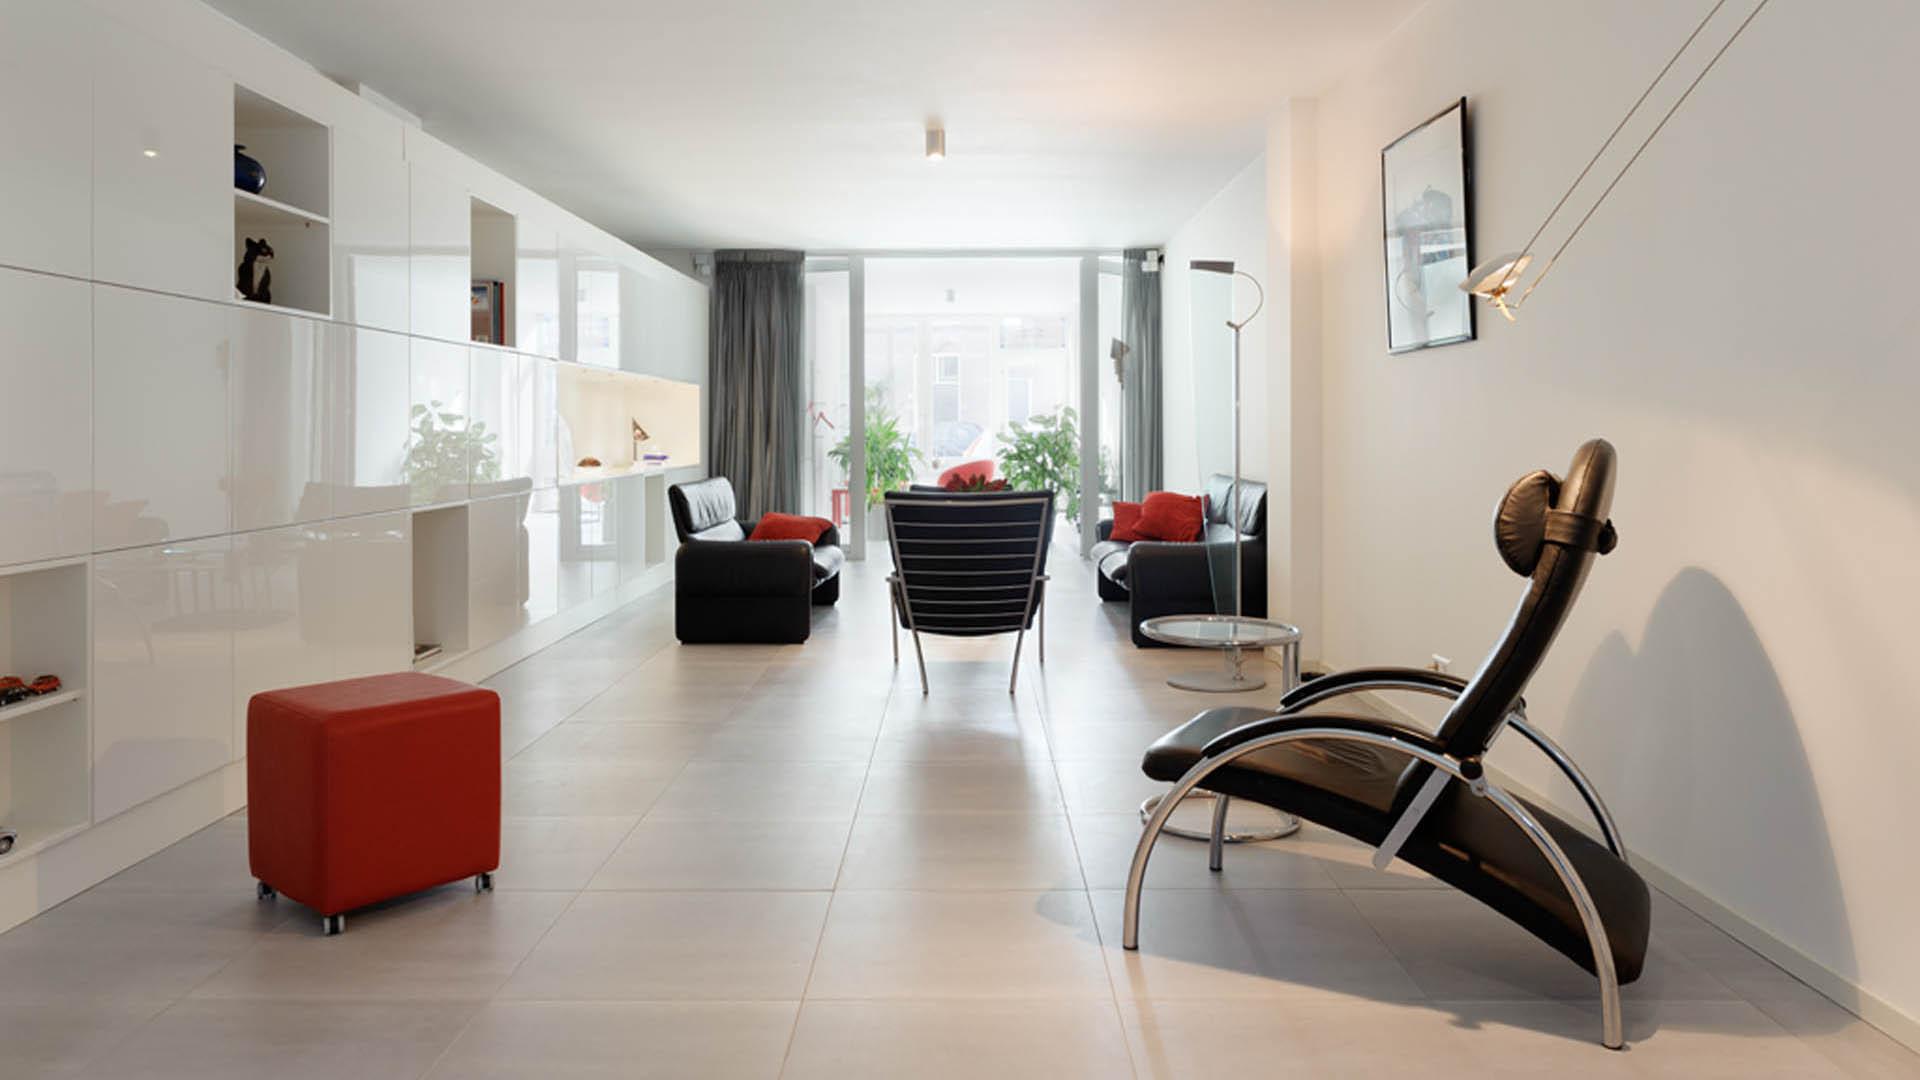 architectuur-delft-renovatie-interieur-transformatie-1 | Studio D11